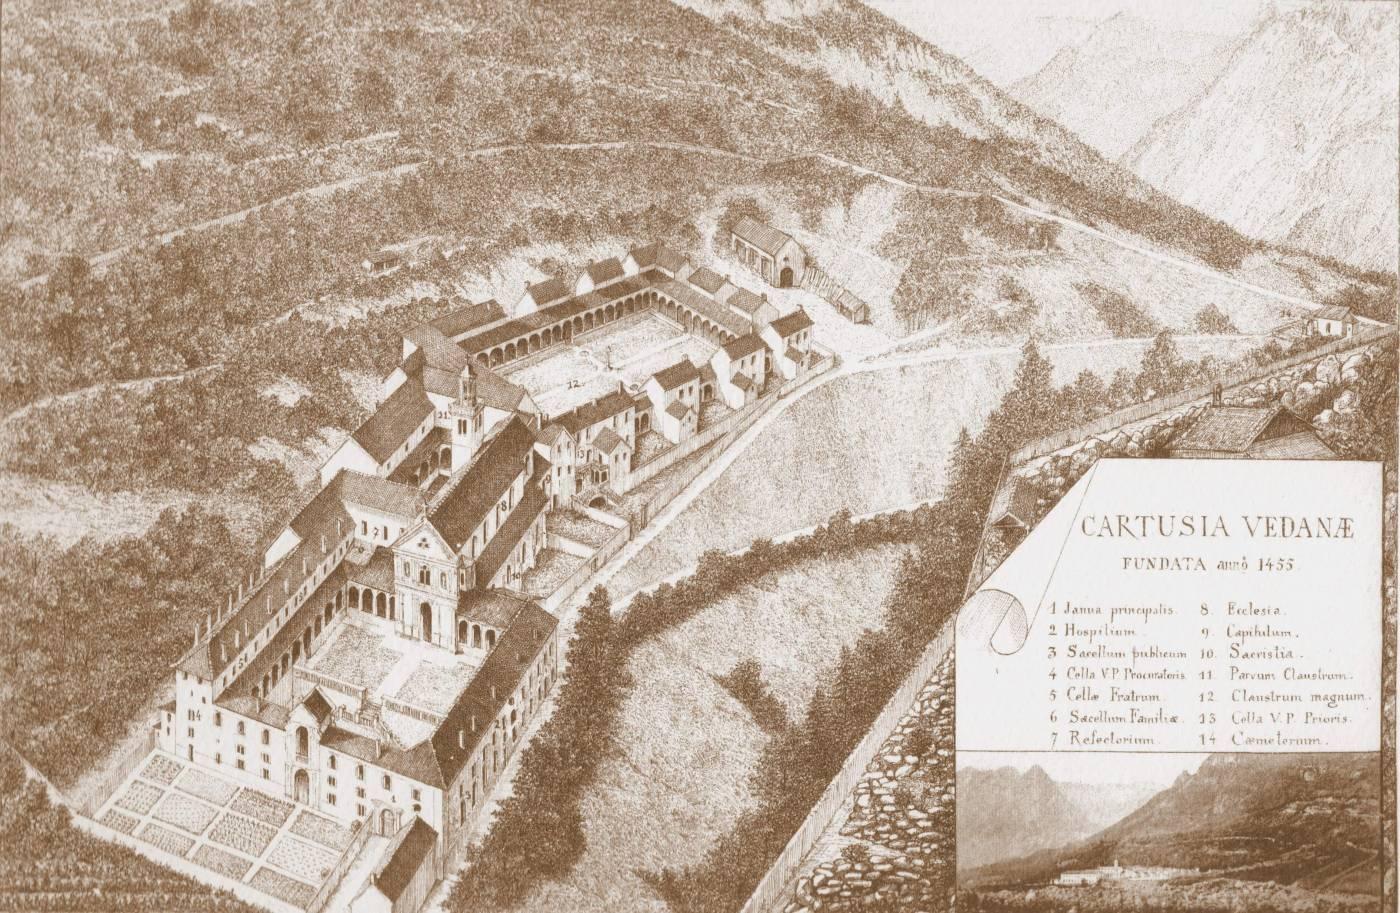 Foto storica - la certosa di Vedana (stampa)